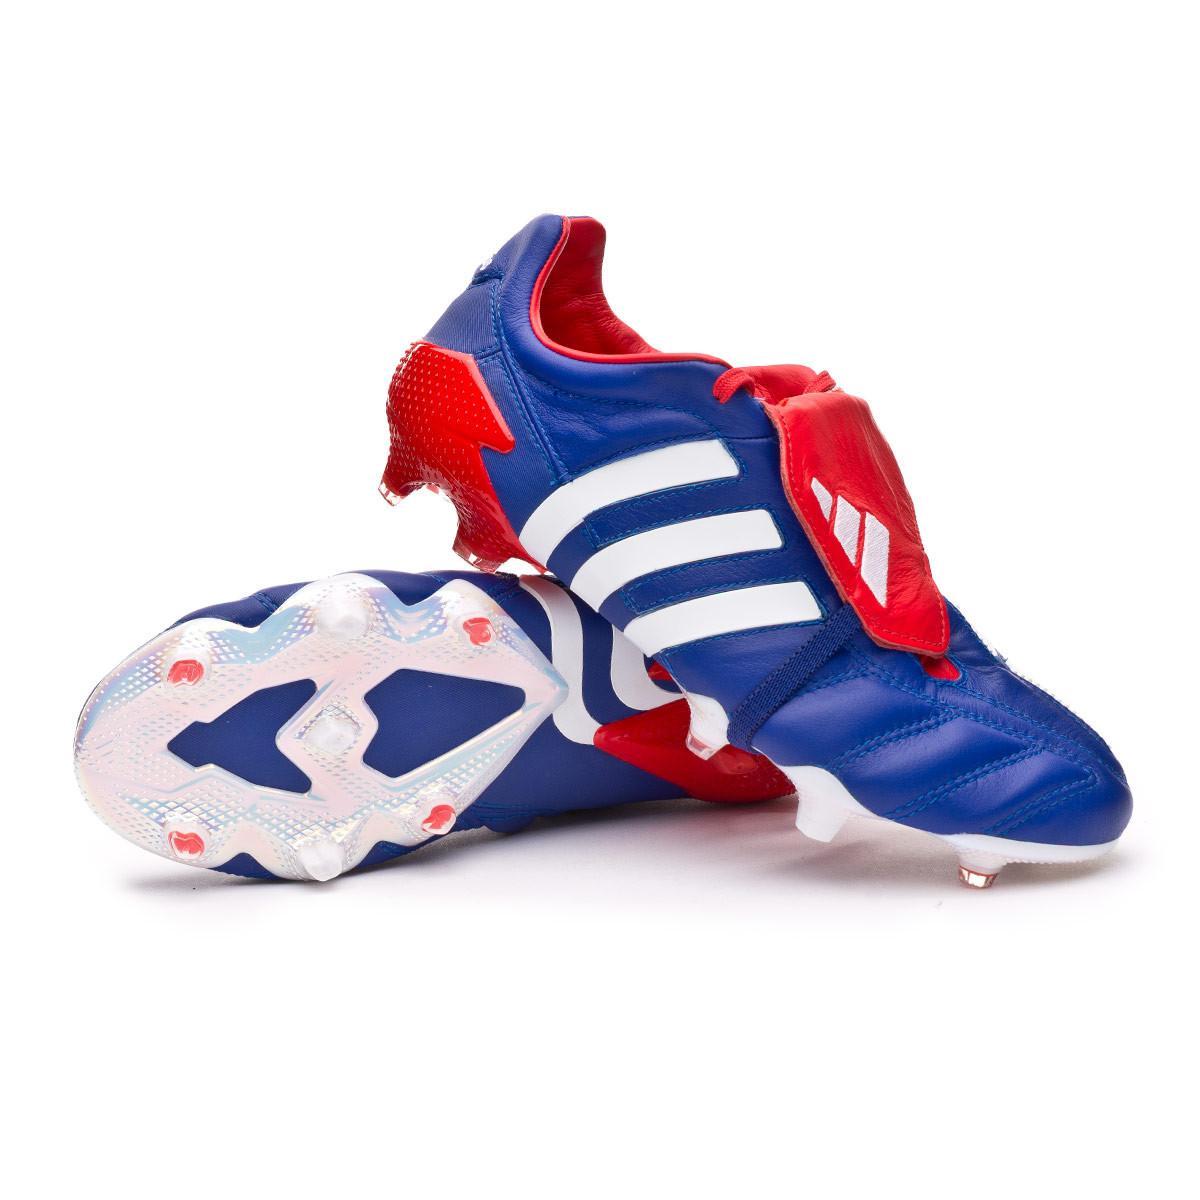 sentido común hambruna Susurro  Zapatos de fútbol adidas Predator Mania FG Japan blue-Red-White - Tienda de  fútbol Fútbol Emotion